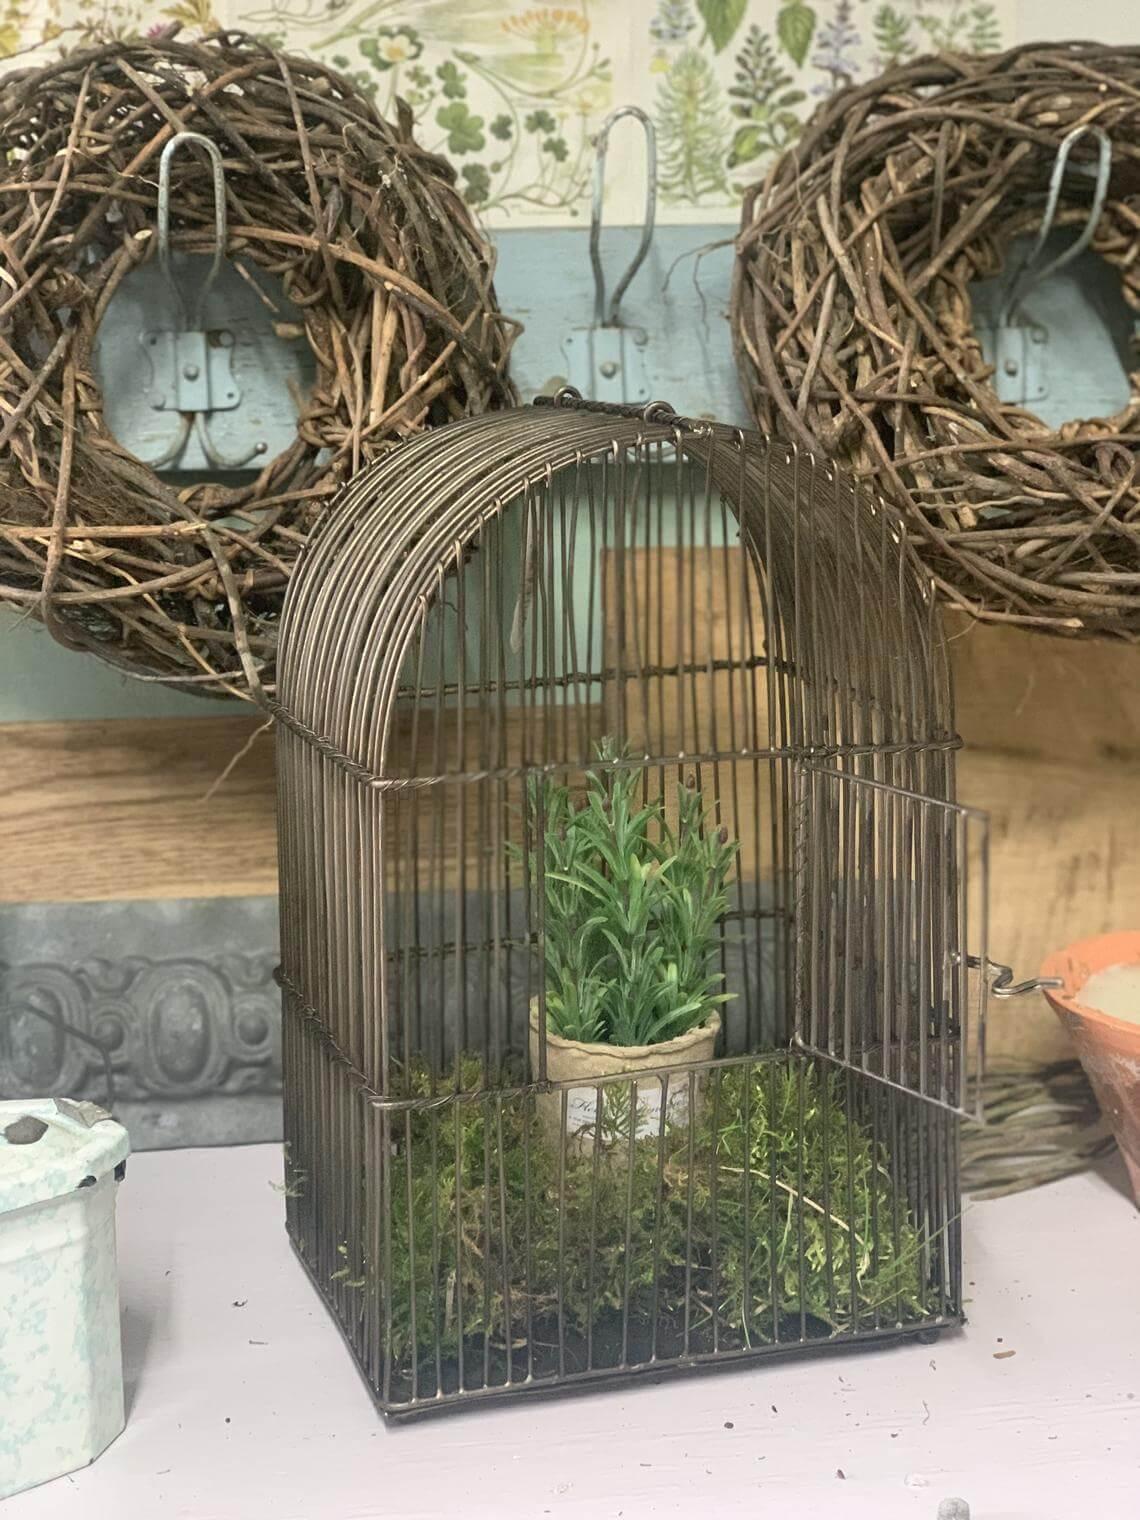 Muted Brass Birdcage Moss and Herb Garden